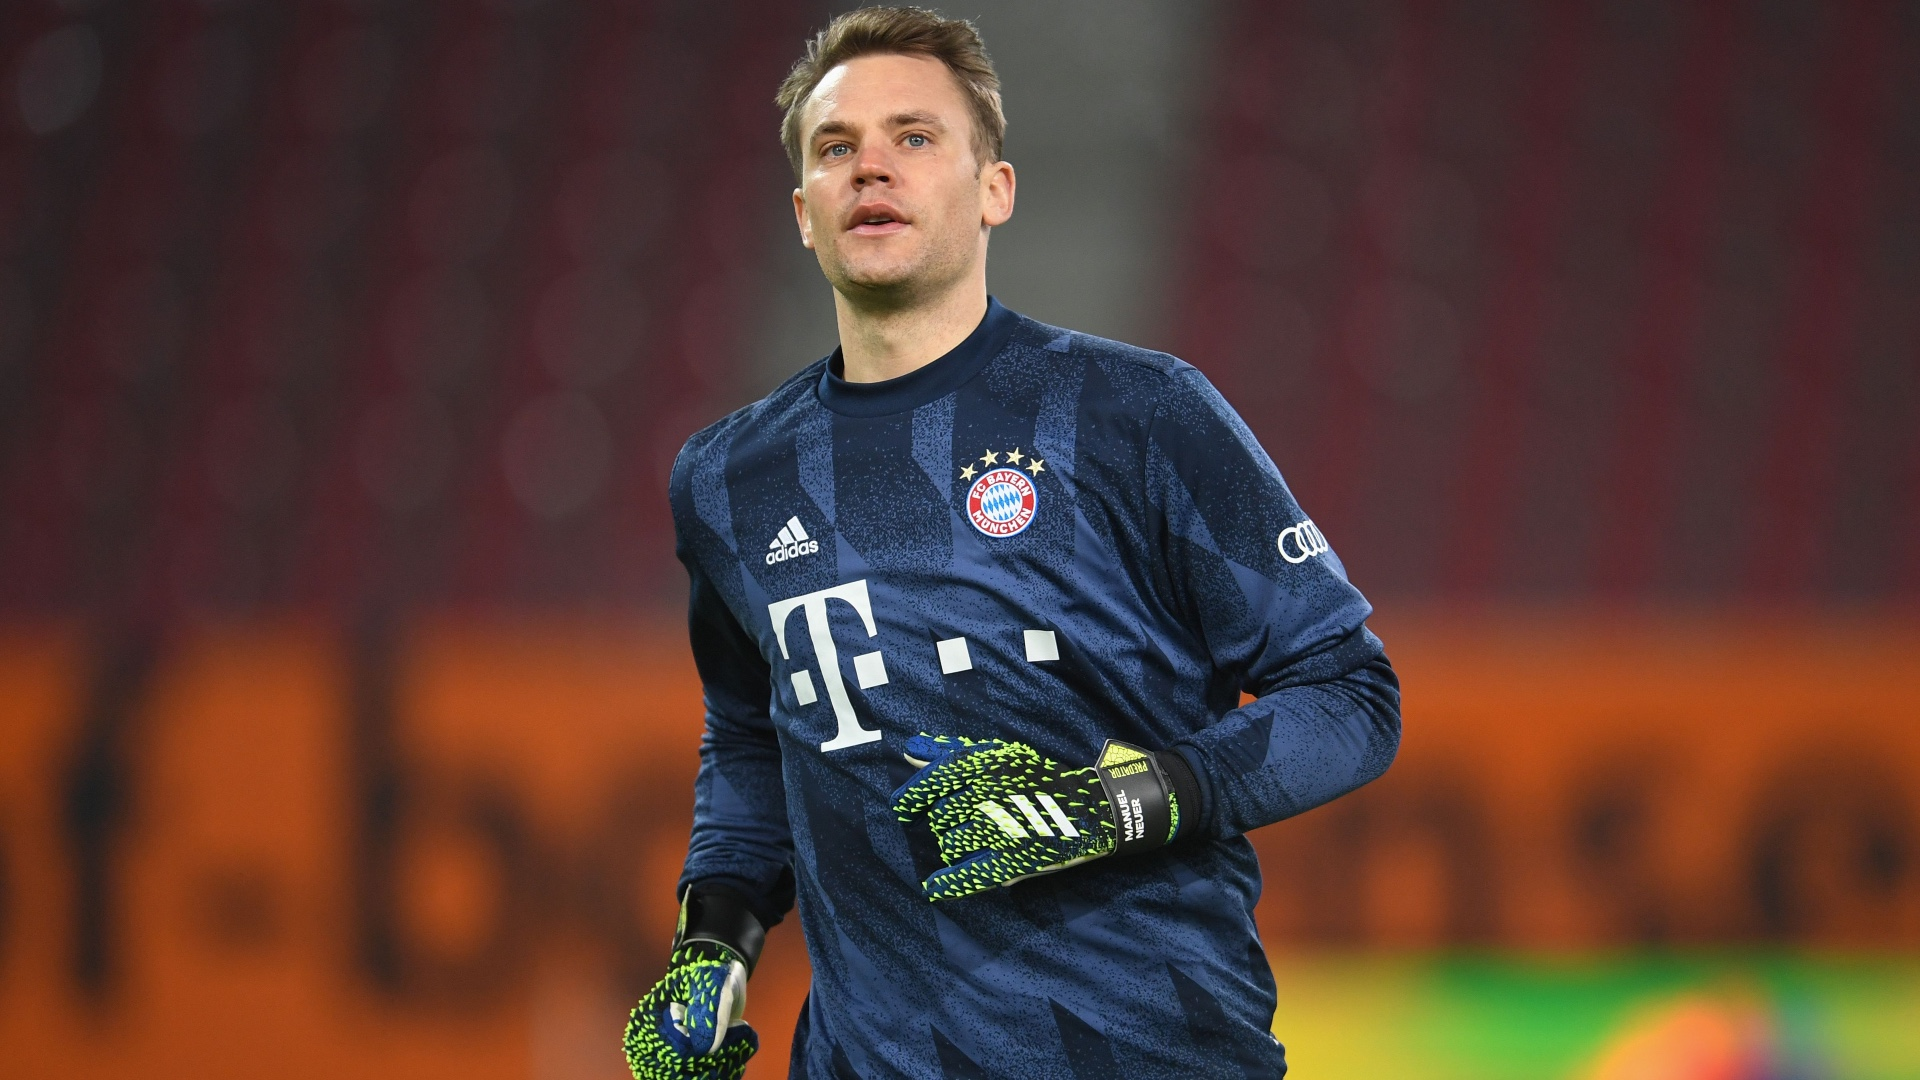 Fc Bayern Immun Gegen Wankelmut Rekord Duo Neuer Lewandowski Ist Die Fcb Konstante Goal Com